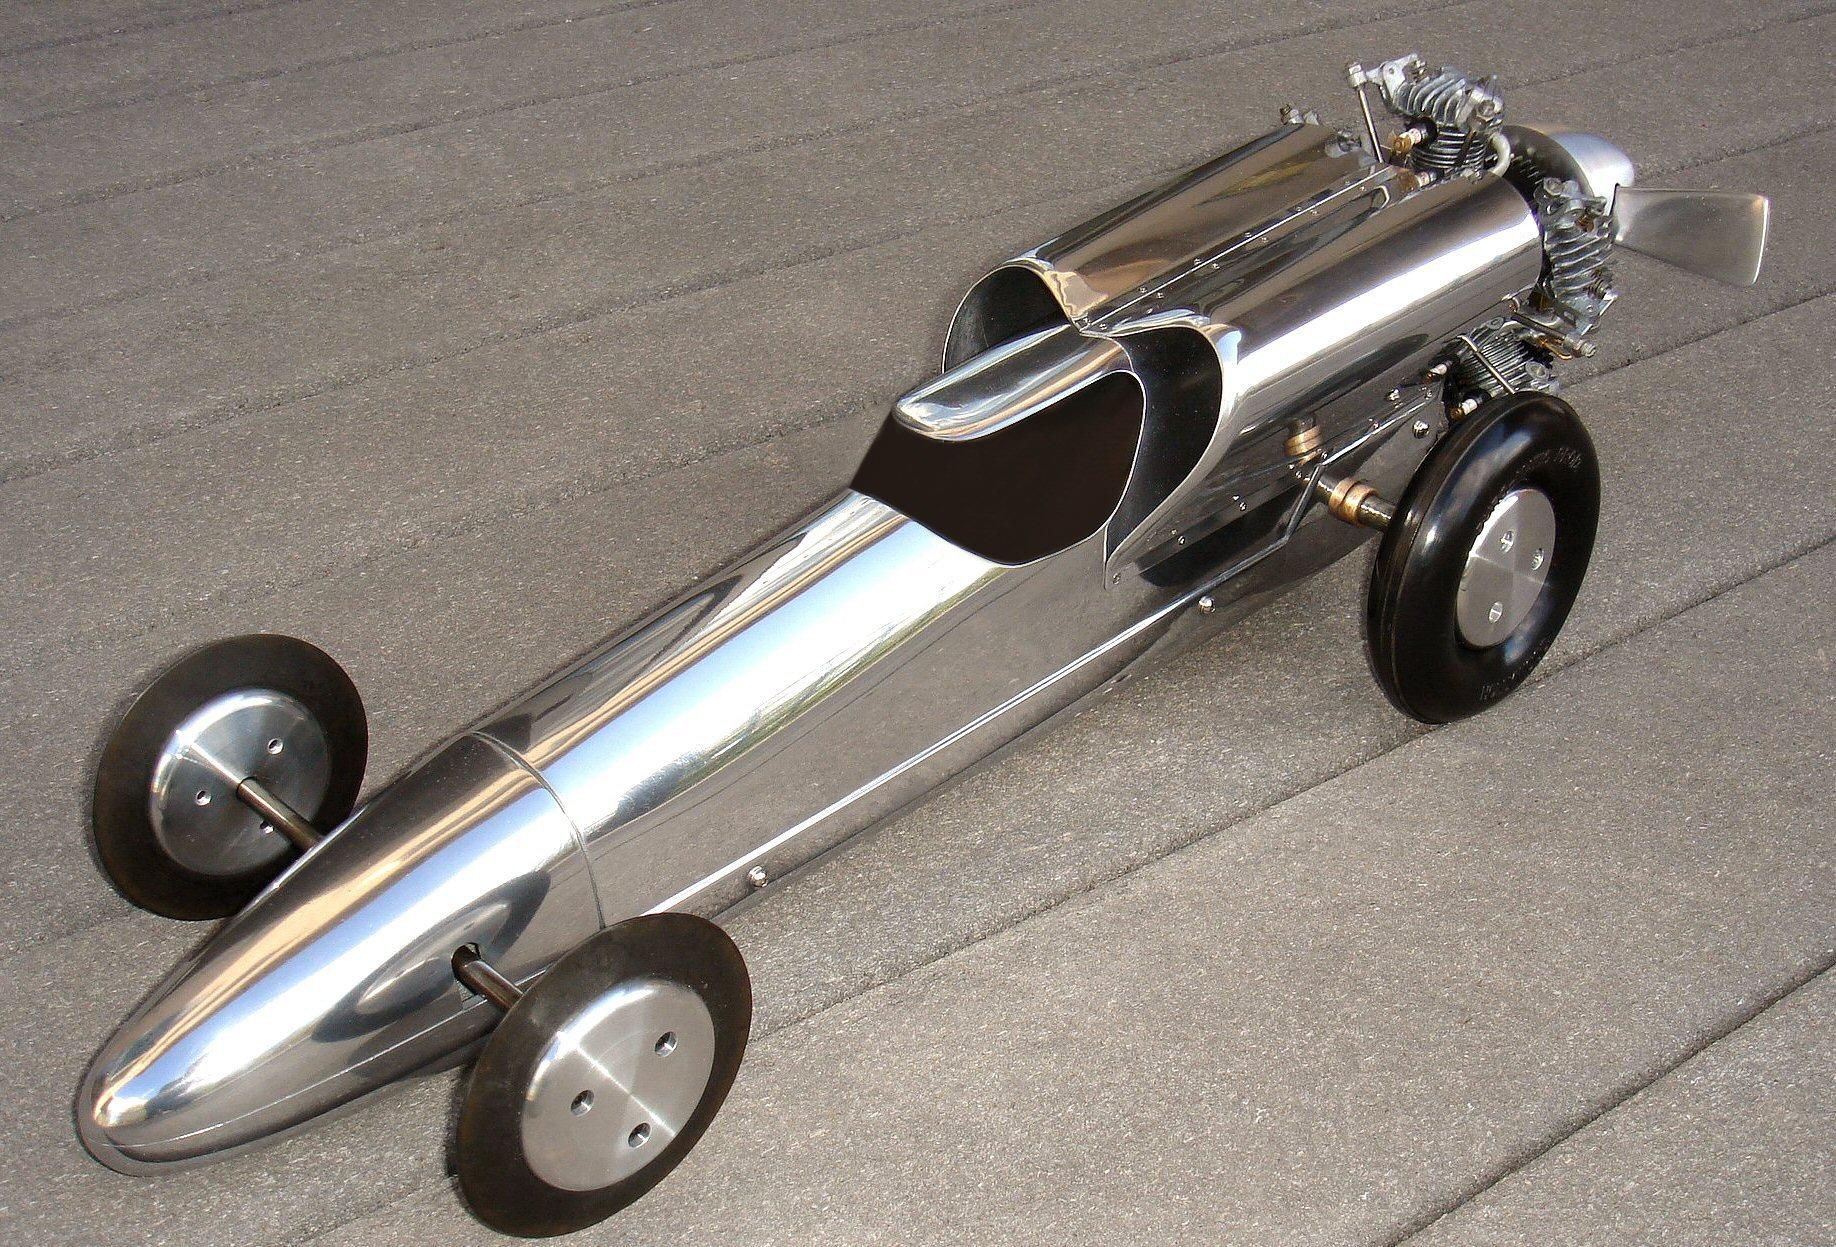 Tether Car Racing World Record